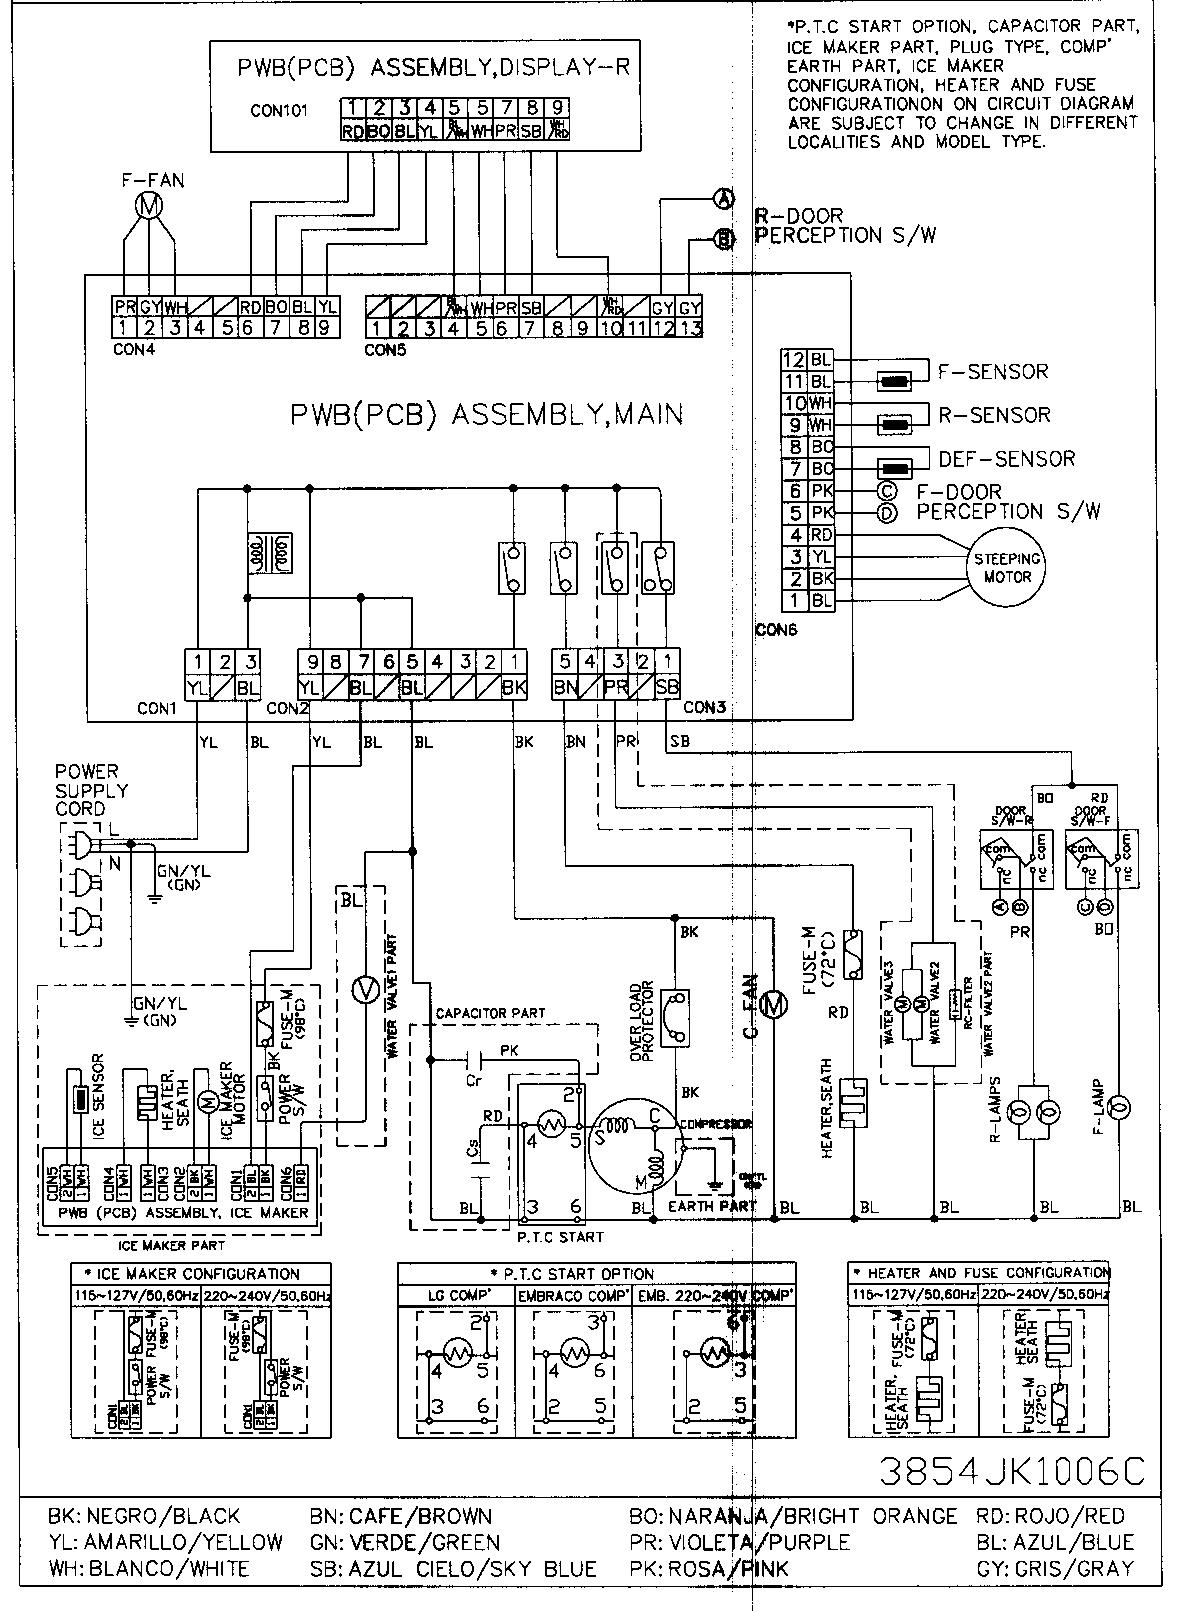 Ge Ice Maker Dispenser Wiring Schematic - 4 Pin Cb Wiring Diagram -  hondaa-accordd.kdx-200.jeanjaures37.fr | Ge Ice Maker Dispenser Wiring Schematic |  | Wiring Diagram Resource